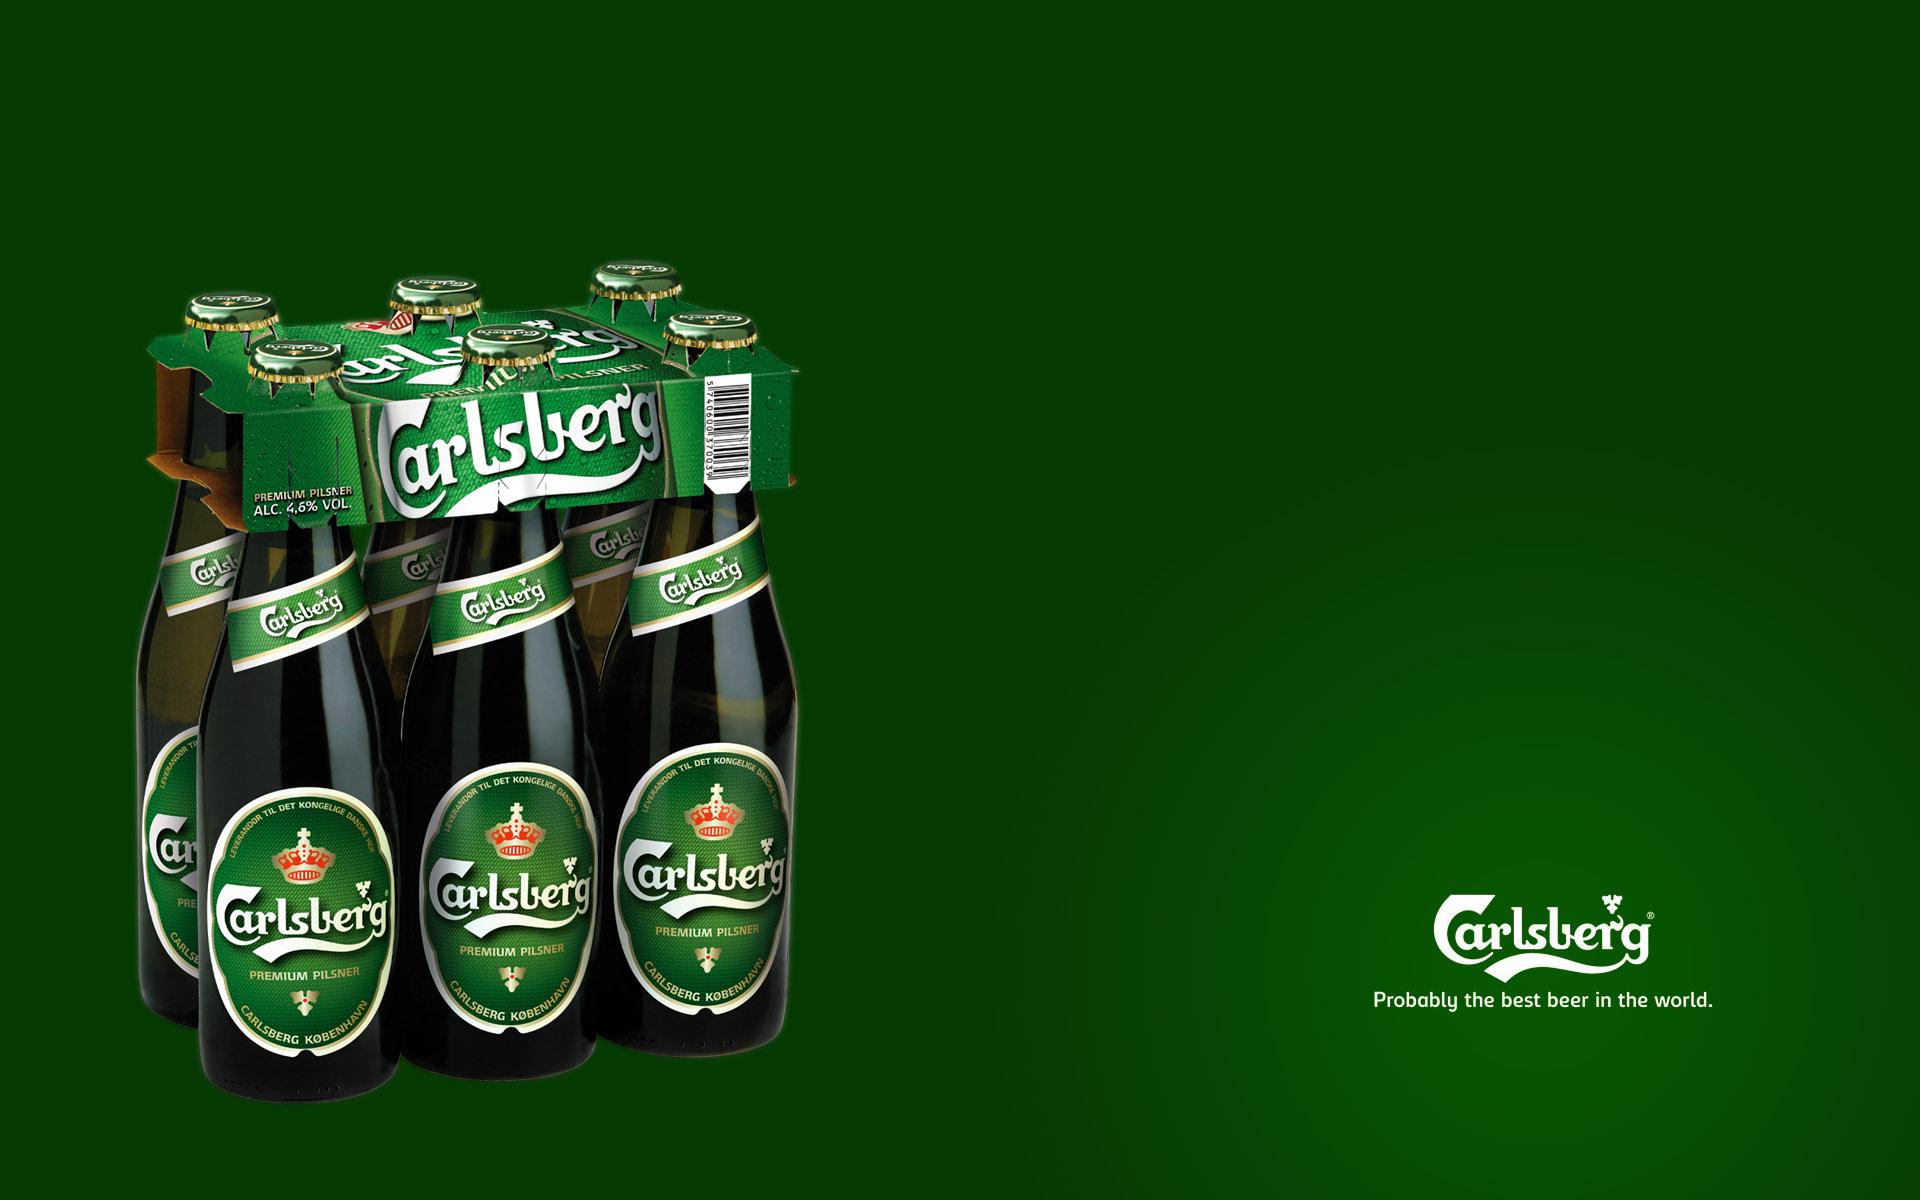 Hd Irish Wallpaper Carlsberg Wallpapers High Quality Download Free